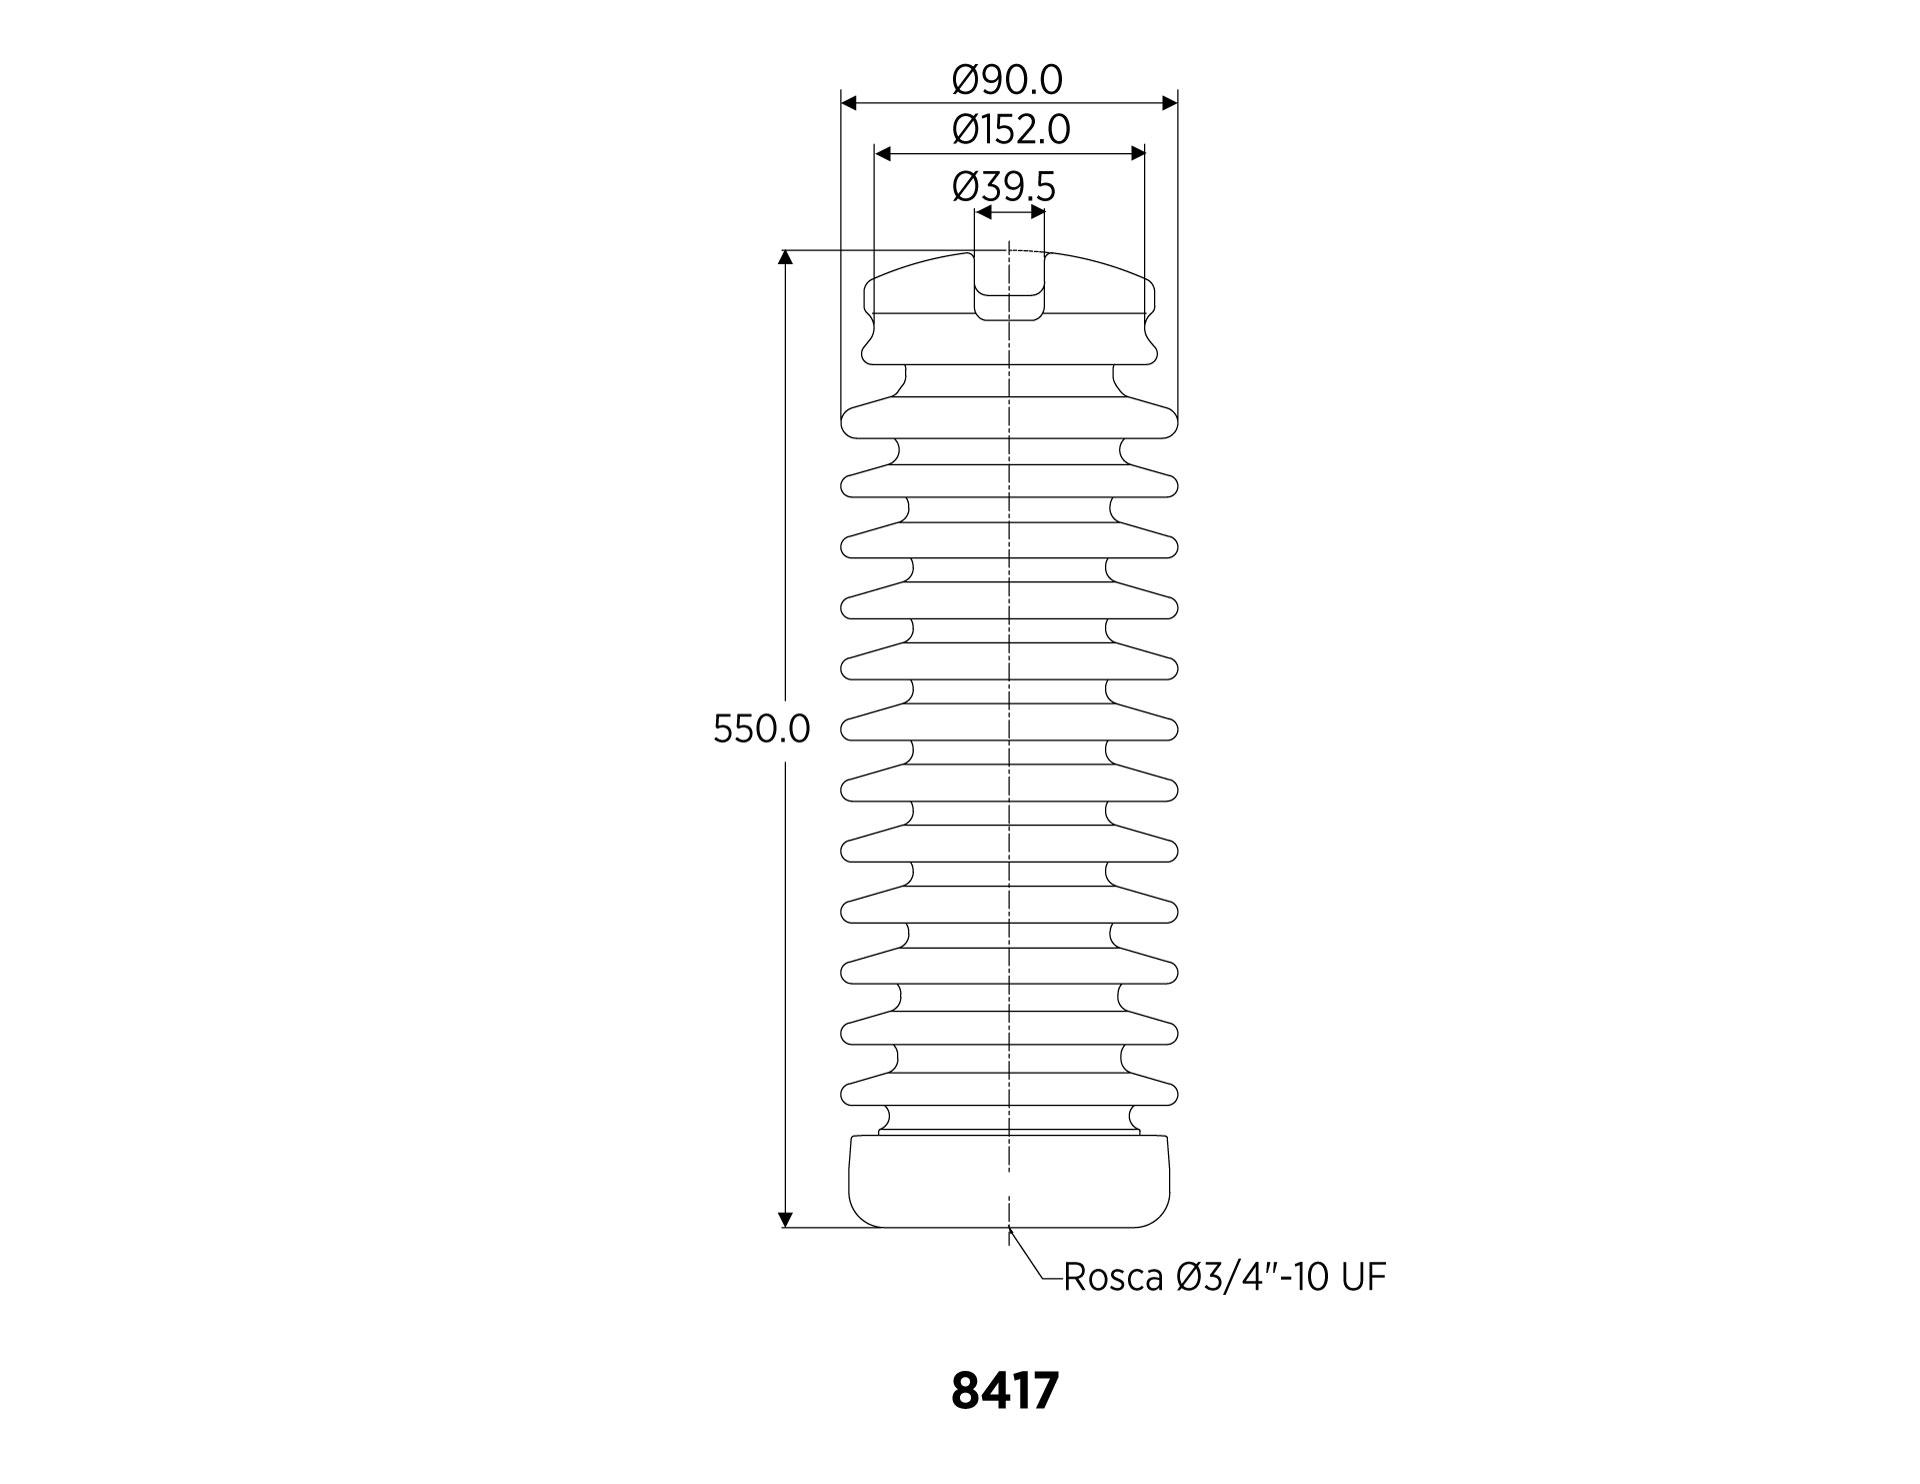 LINE POST ANSI 57-5 12.5kN 66KV